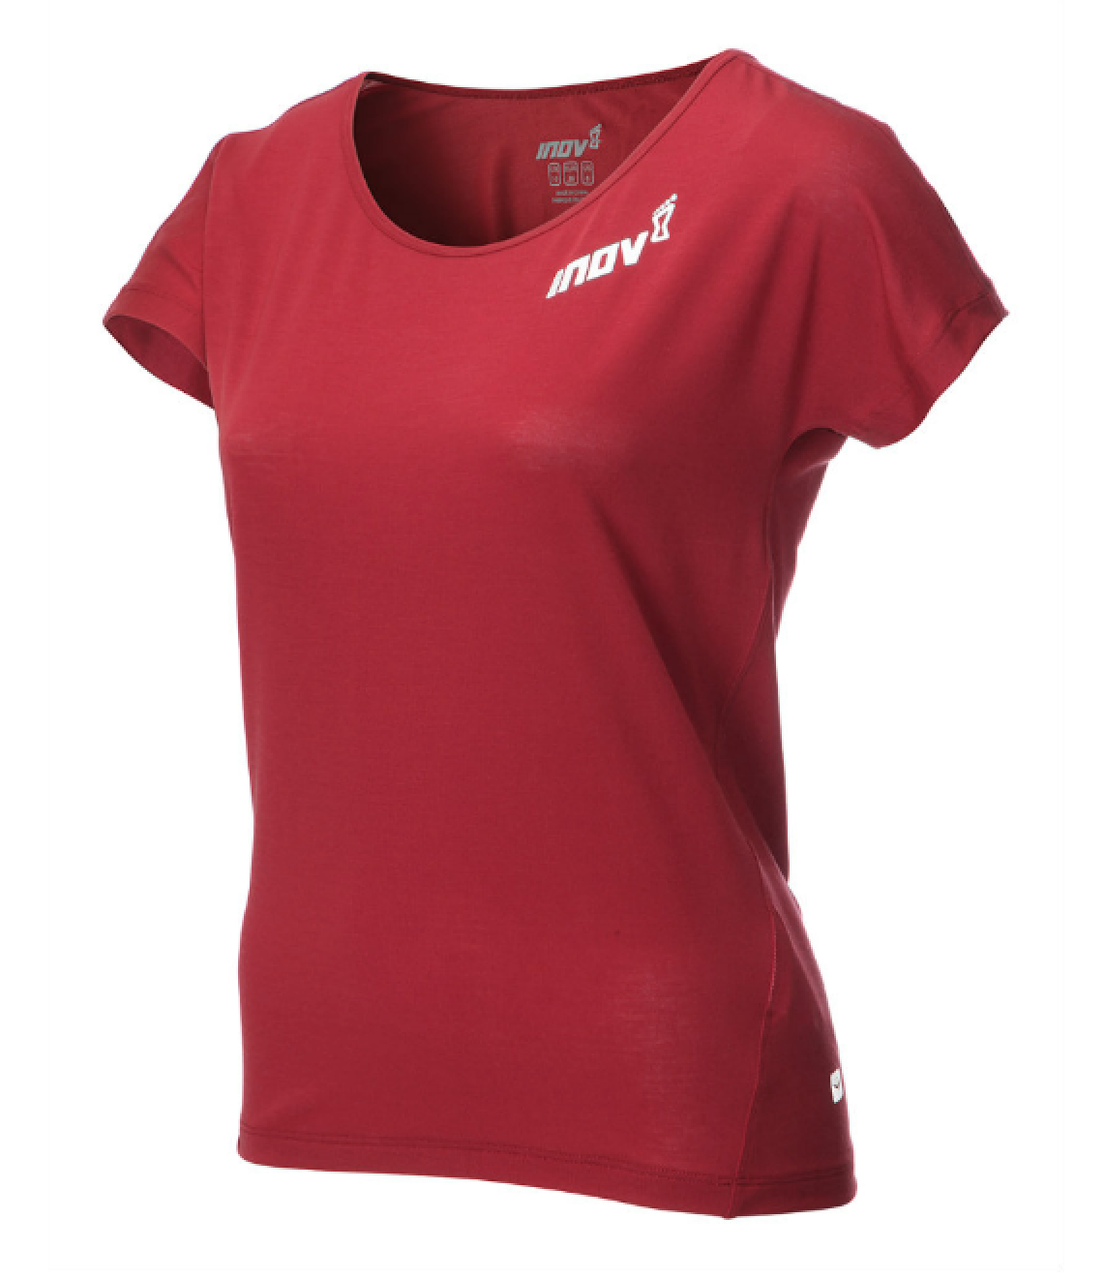 AT/C DRI Release женская футболка для бега XL - INOV-8 Ukraine в Киеве